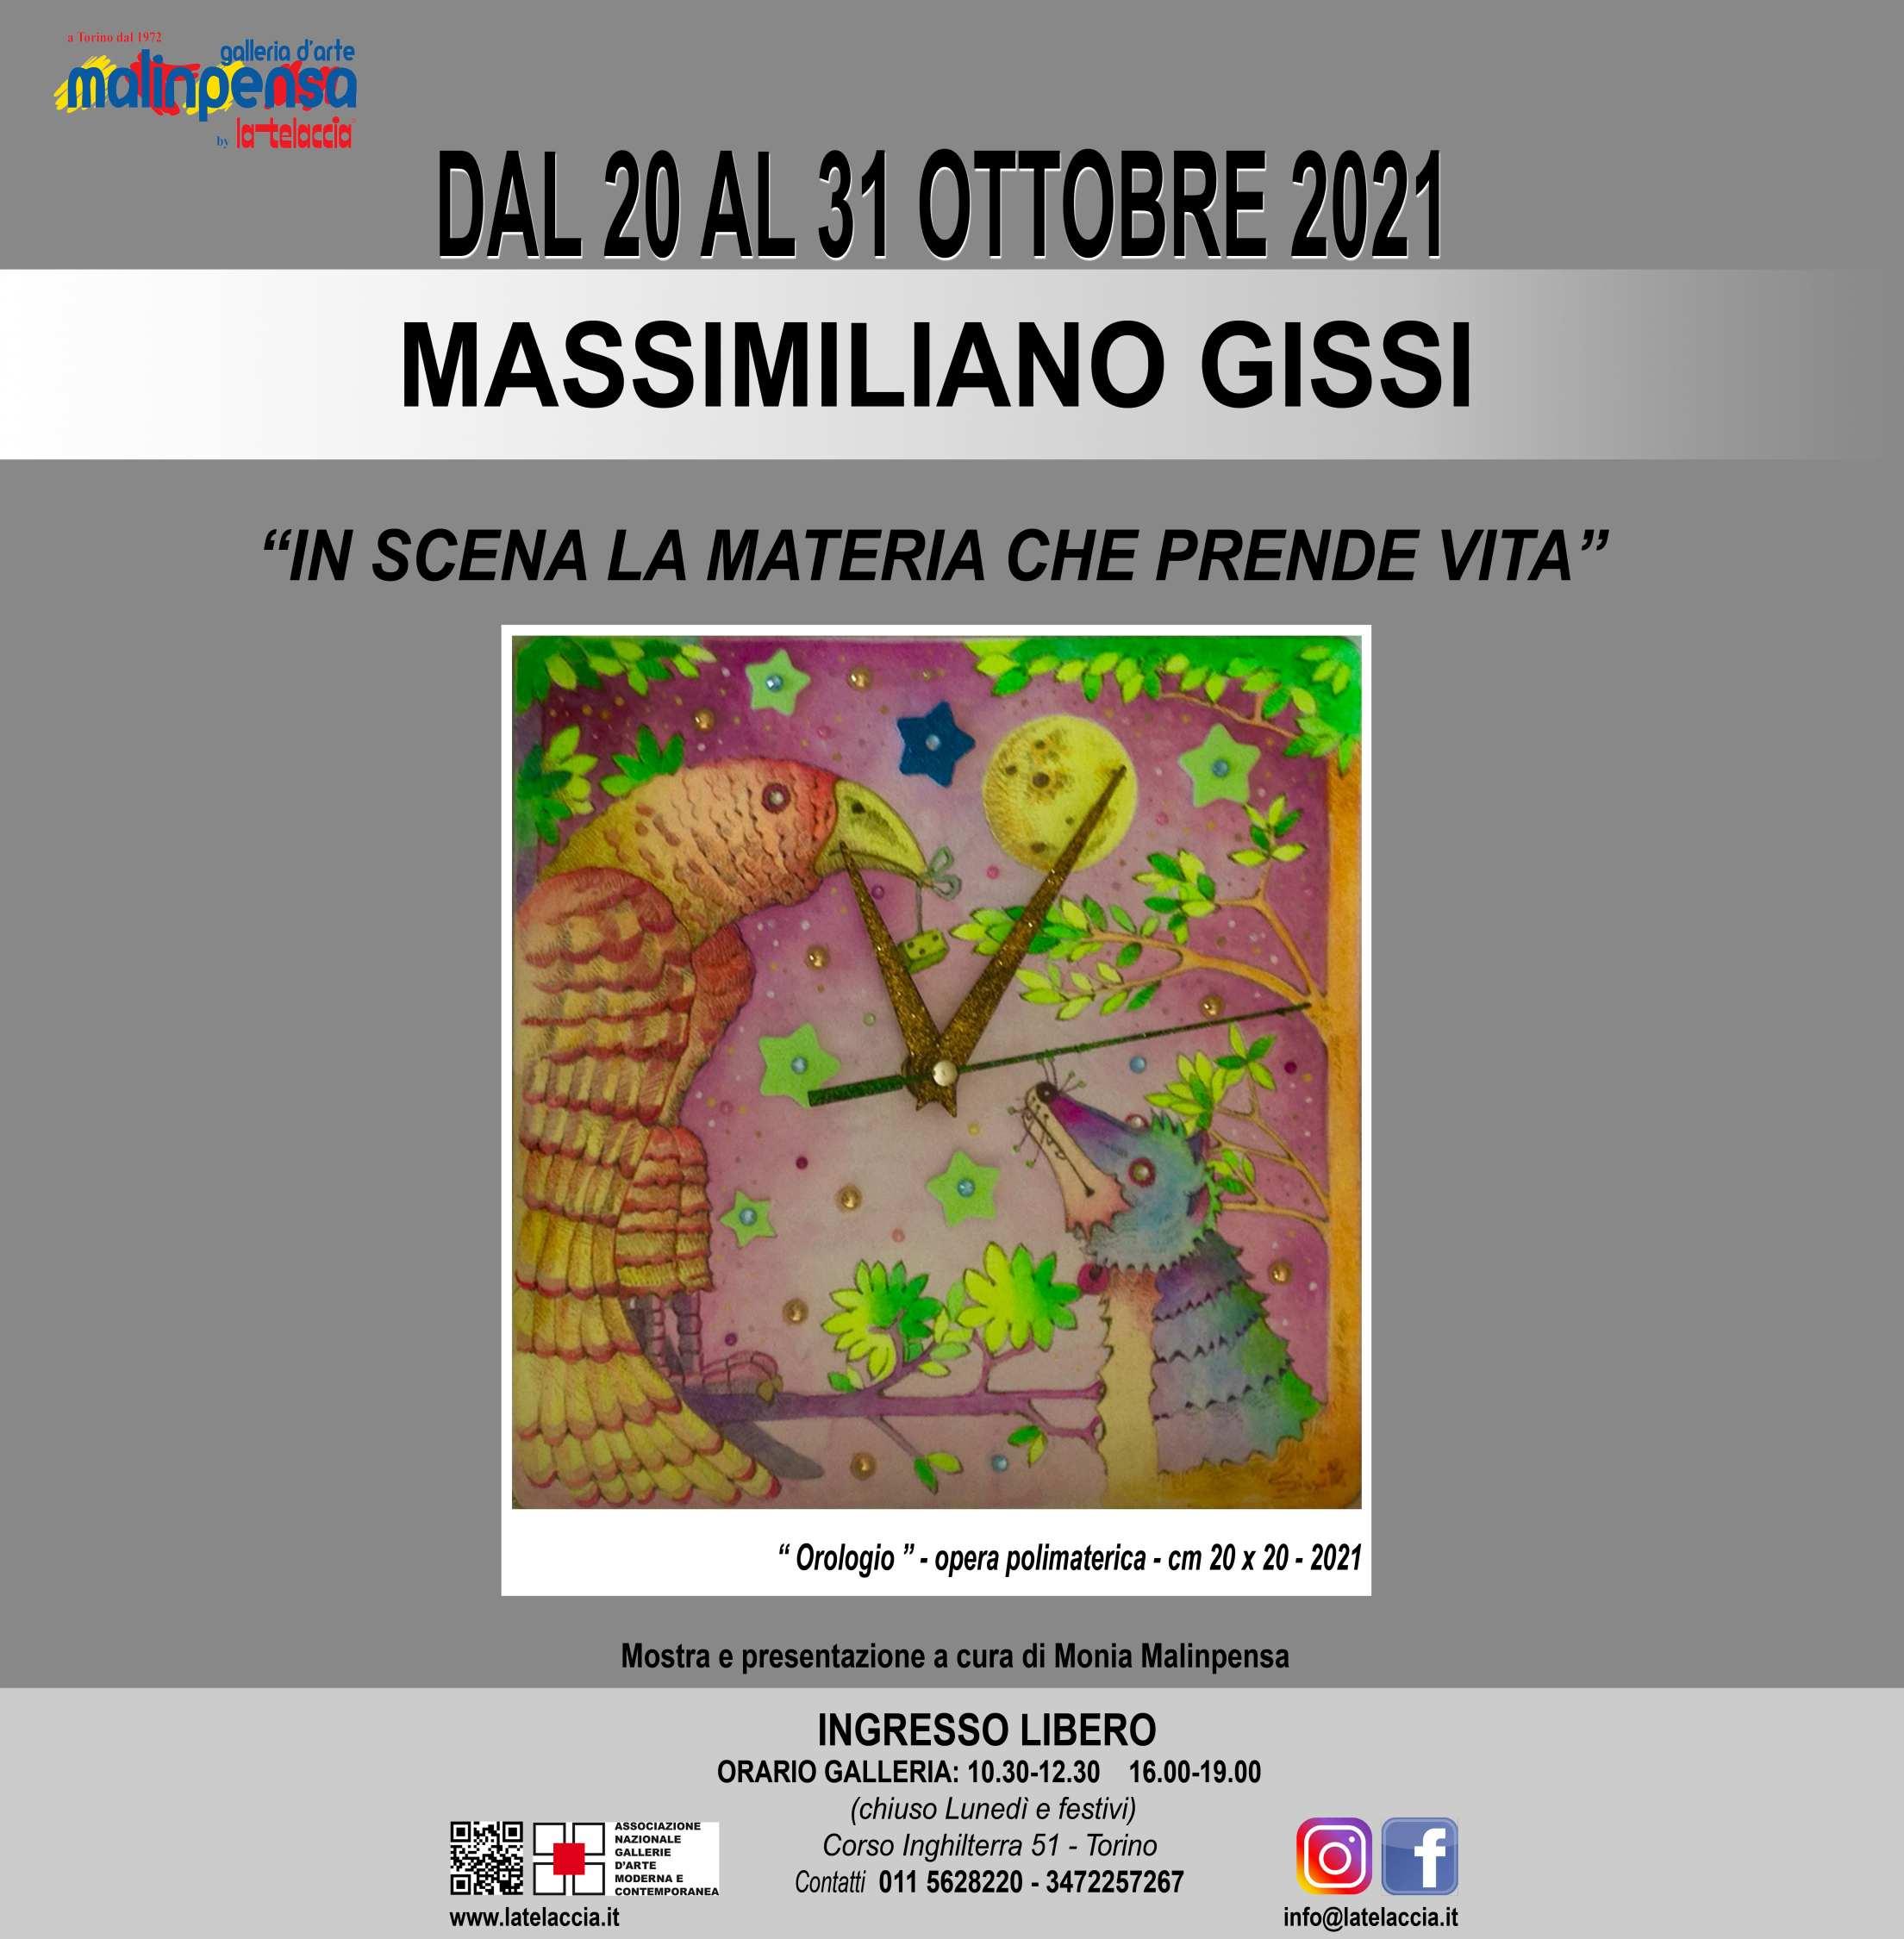 MOSTRA_GISSI_ISTAGRAM_2021.jpg